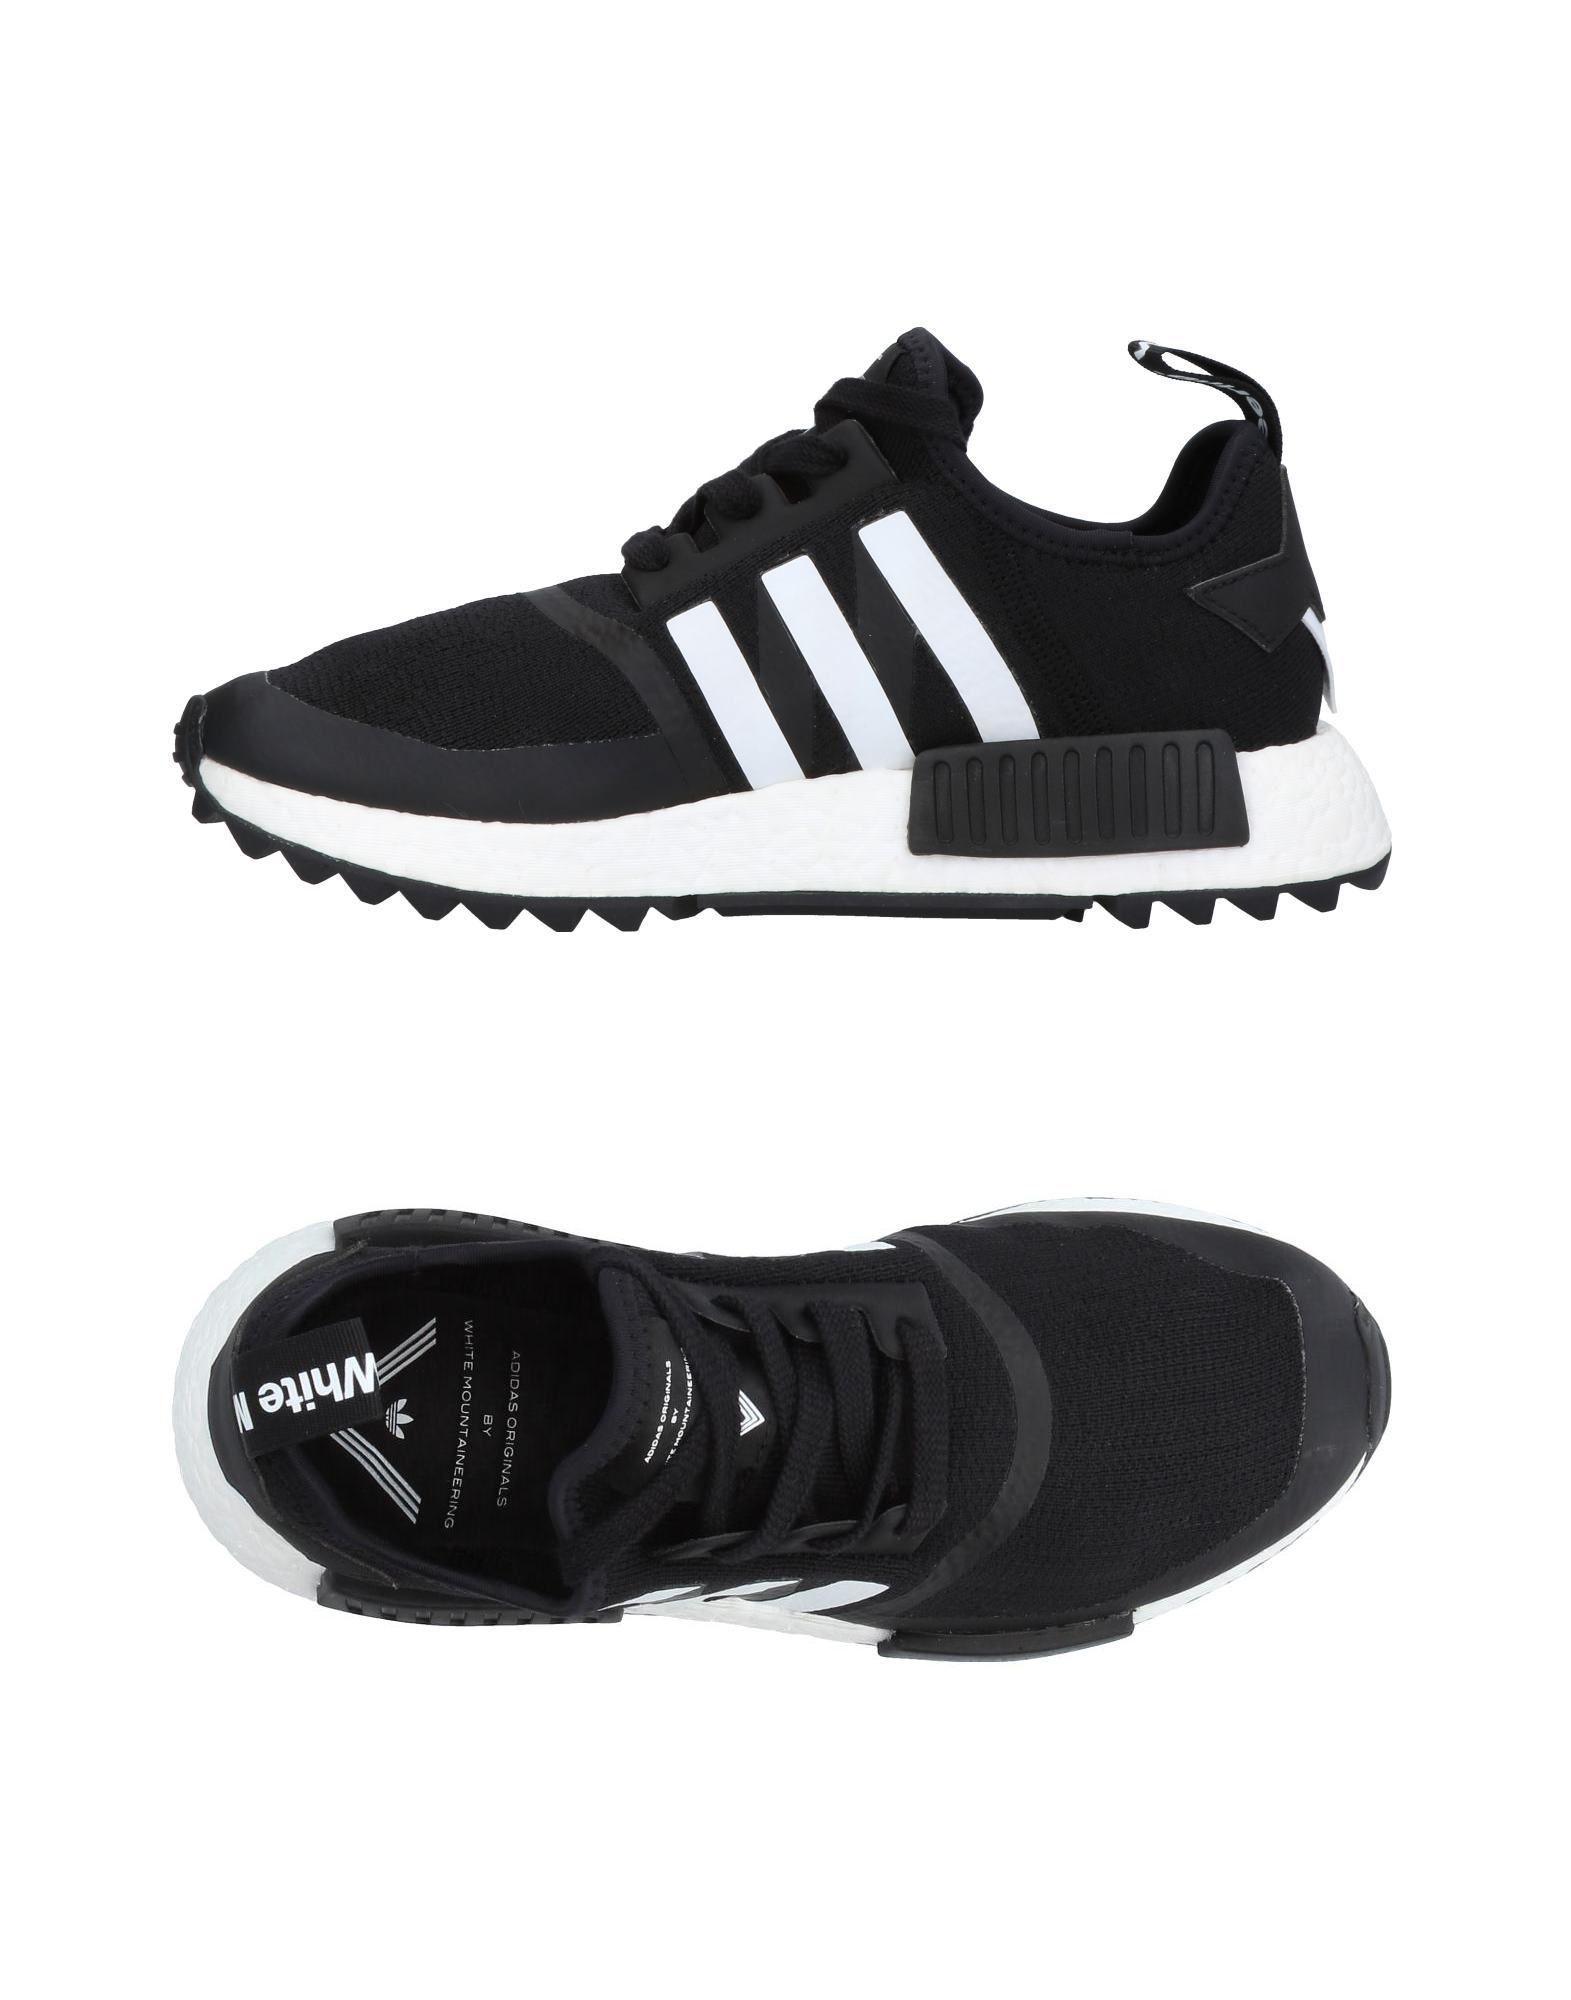 premium selection 55069 45d15 ADIDAS X WHITE MOUNTAINEERING .  adidasxwhitemountaineering  shoes  .  MontañismoZapatillas Deportivas De HombreAdidas Originales